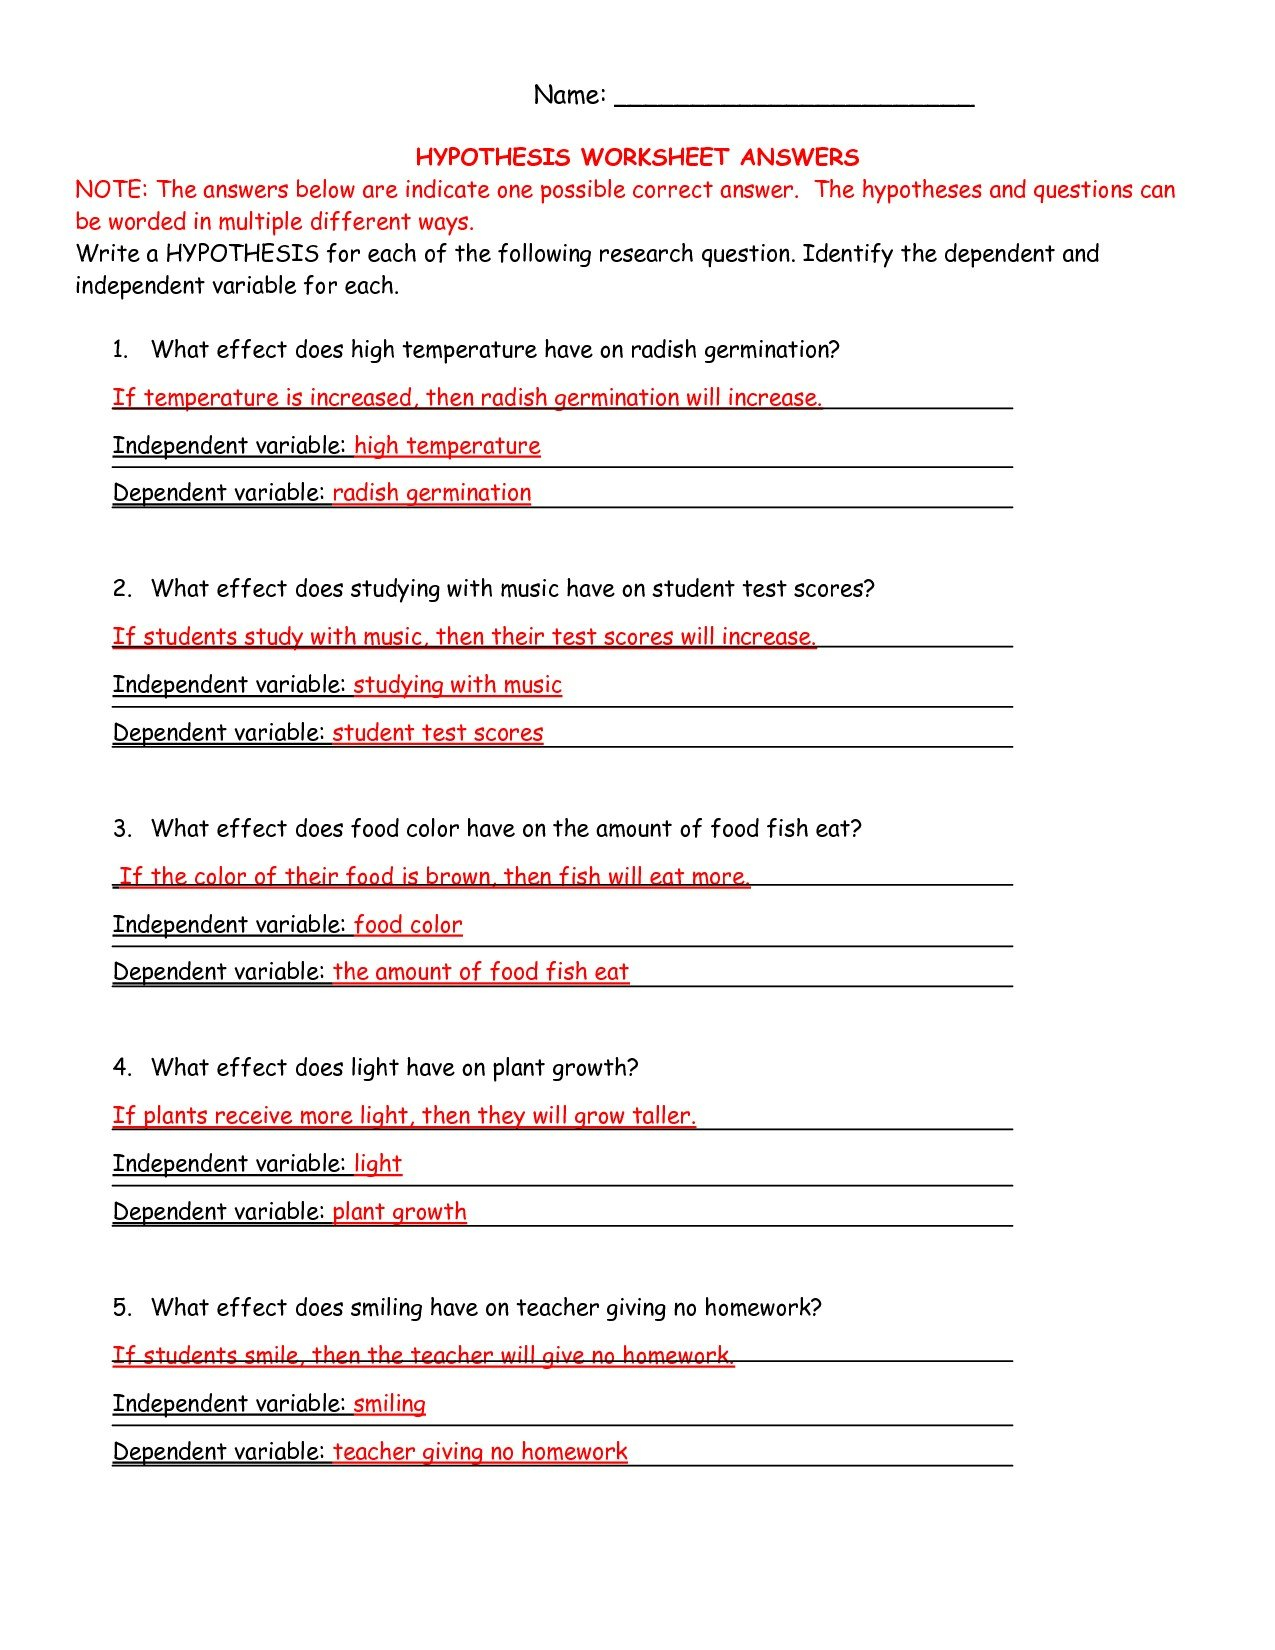 20 Elegant Mythbusters Penny Drop Worksheet Answers Pics  Grahapada Regarding Mythbusters Penny Drop Worksheet Answers